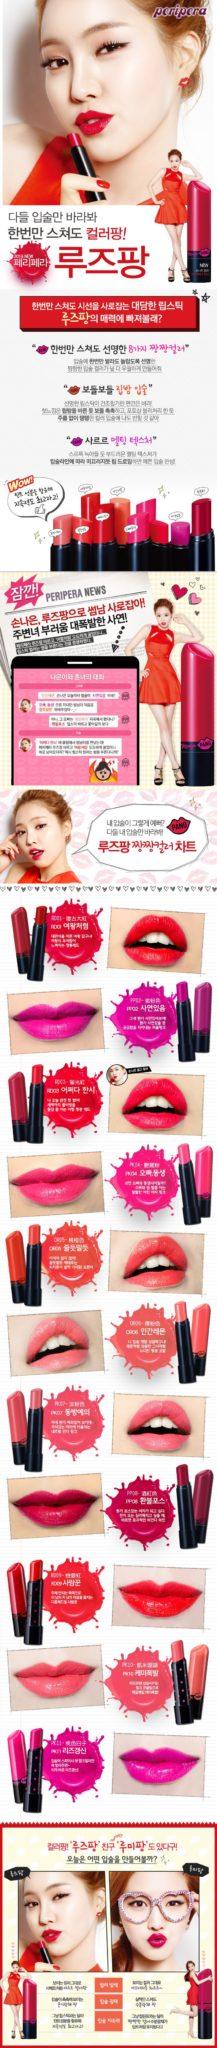 peripera rouge pang lipstick korean cosmetic makeup product online shop malaysia vietnam china1